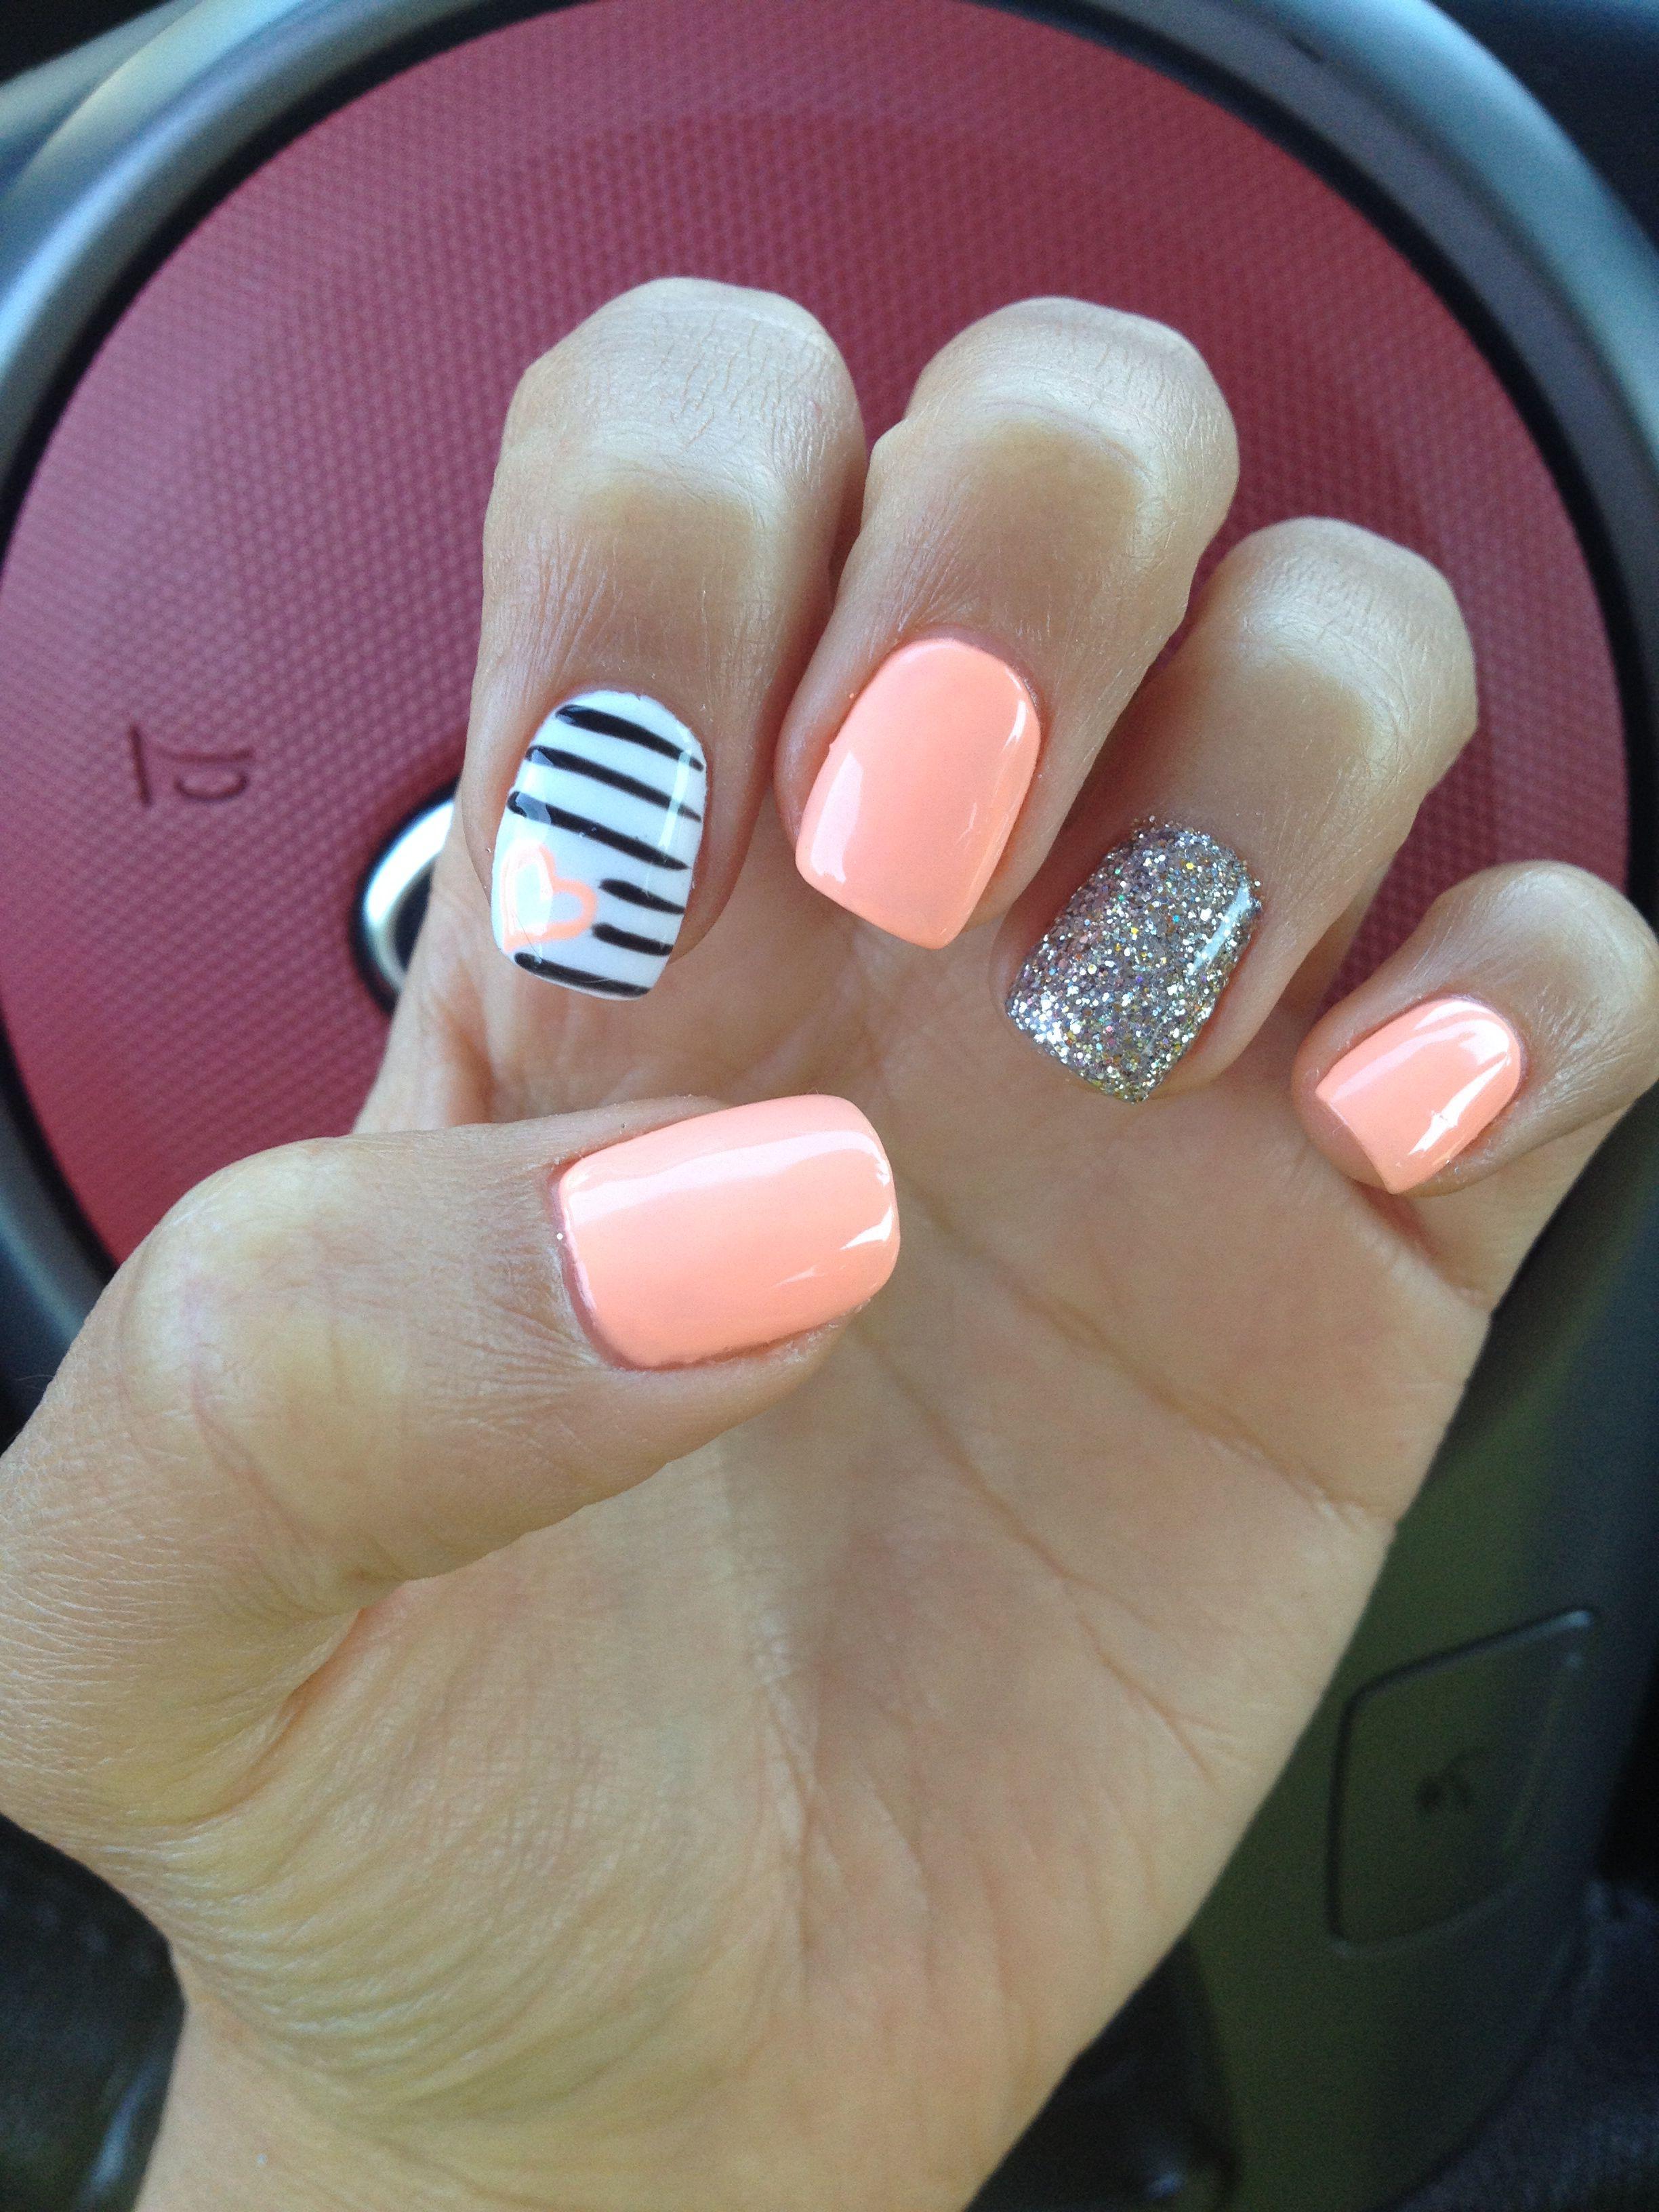 Coral Nails With Heart Cool Pinterest Uñas Lindas Diseños De